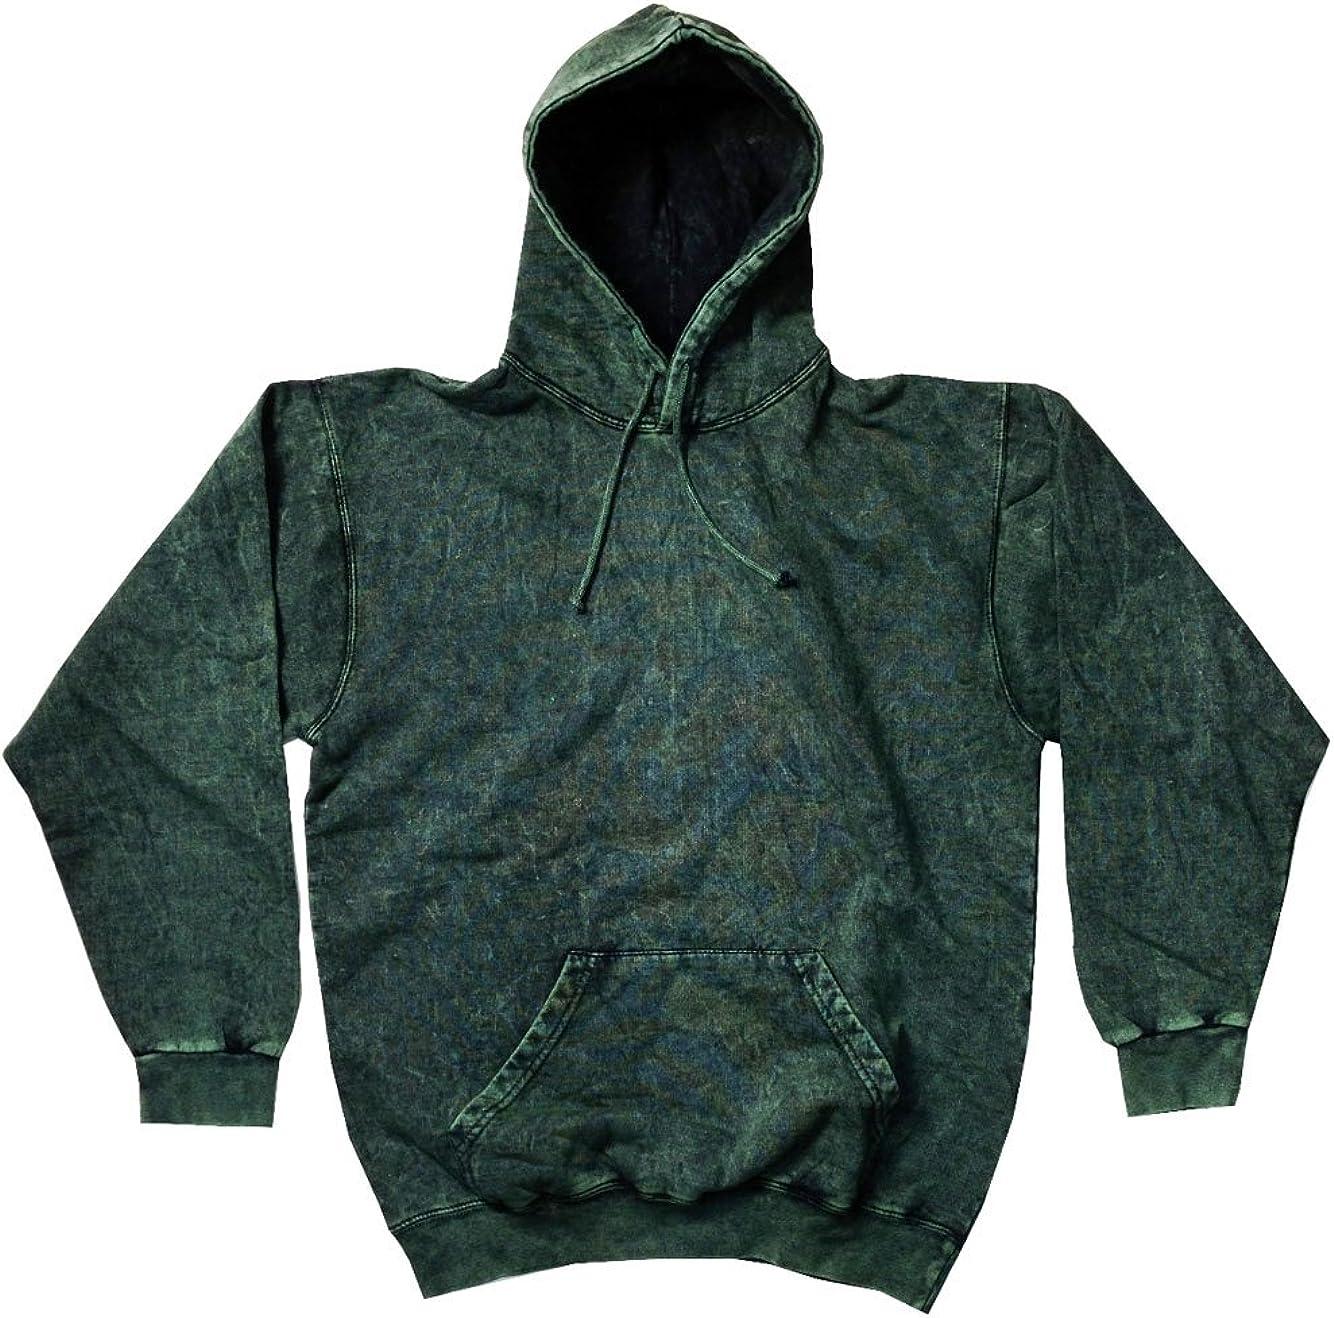 3XL Long Sleeve Pockets No Zipper Colortone Cotton Mineral Wash Black Hoodie S